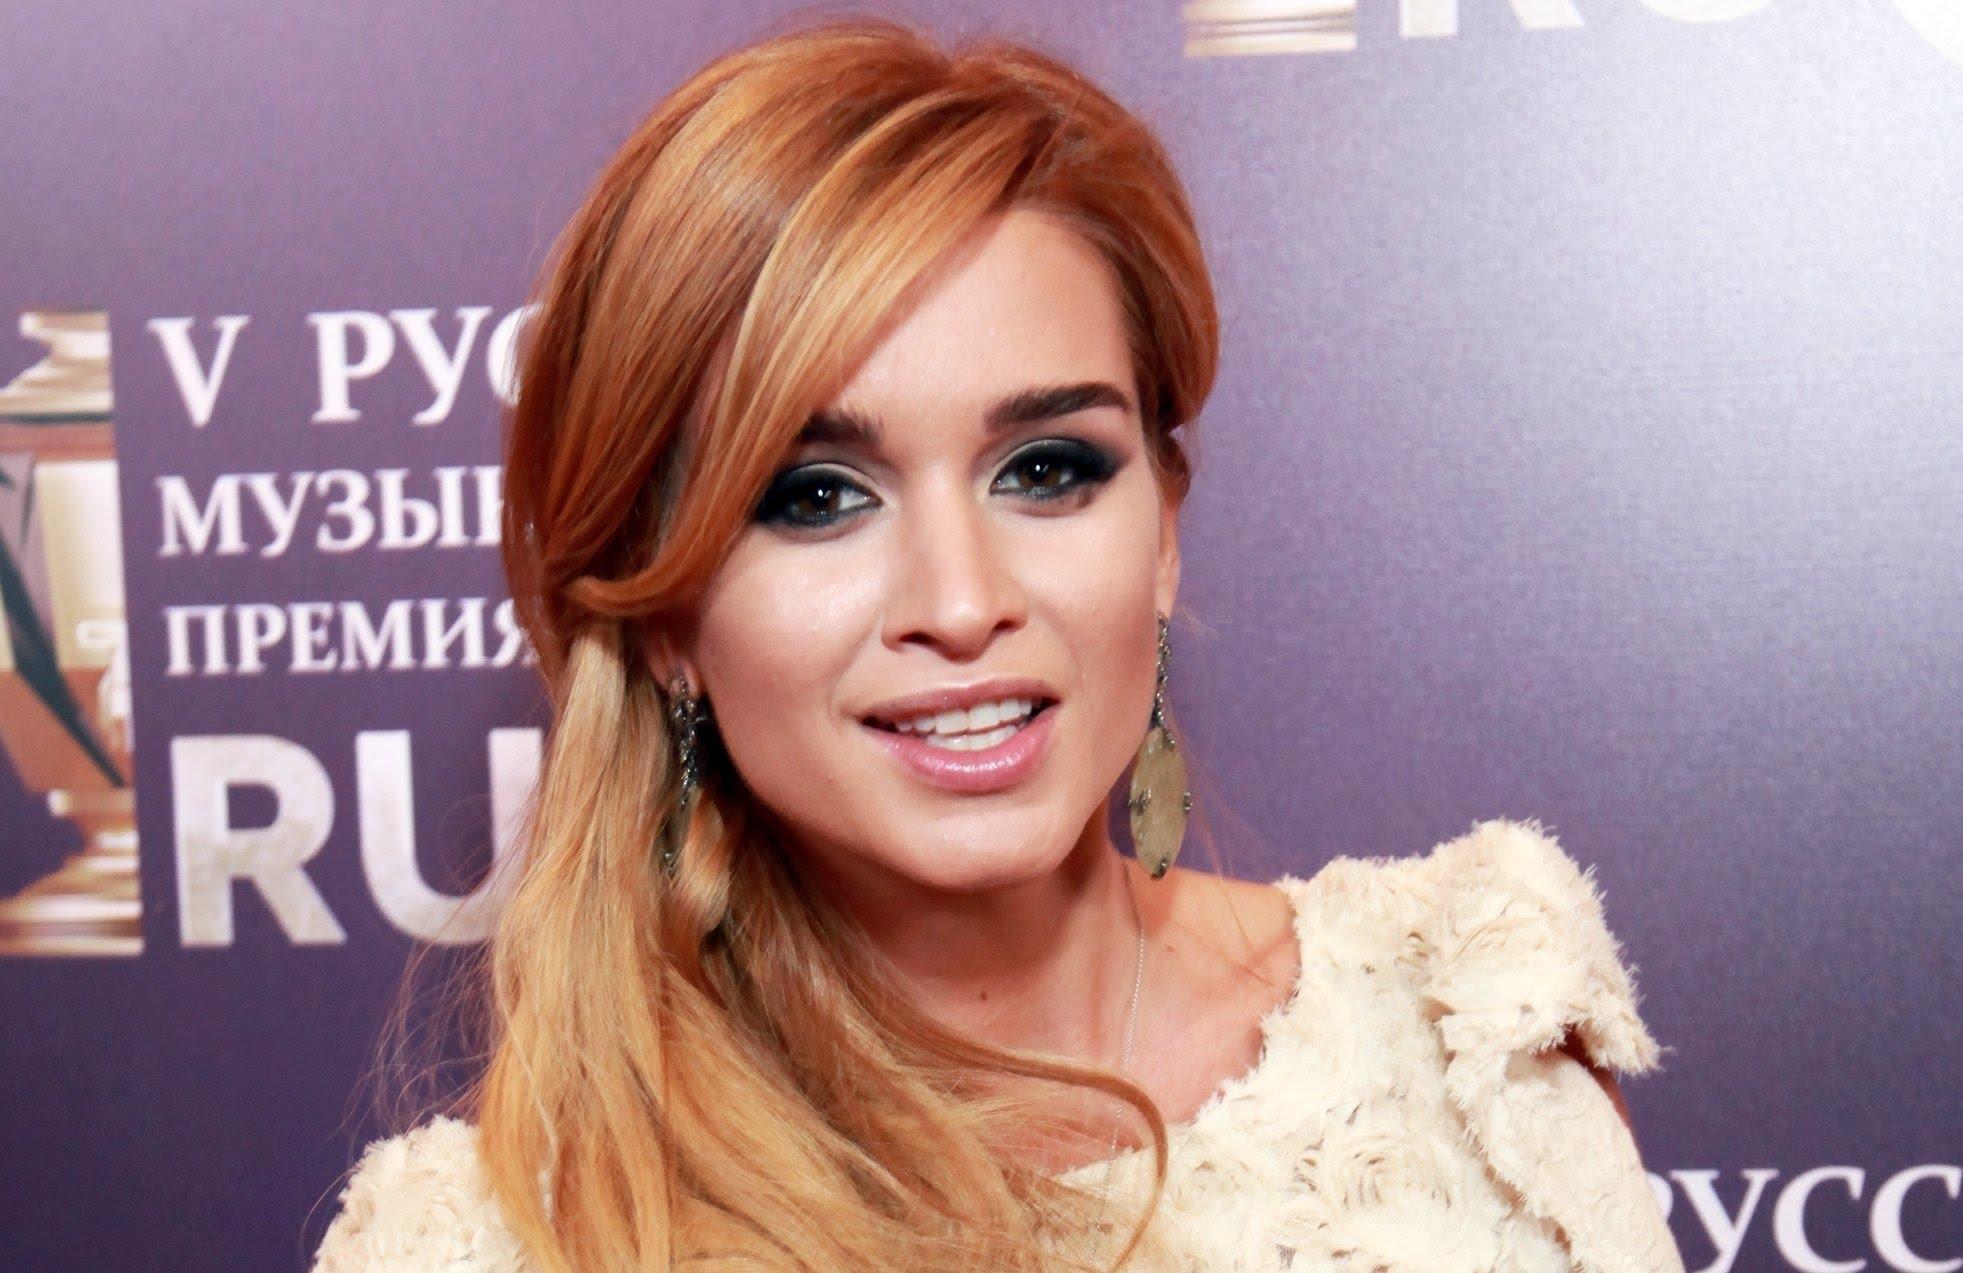 Ксения Бородина нарядила дочь в обновки